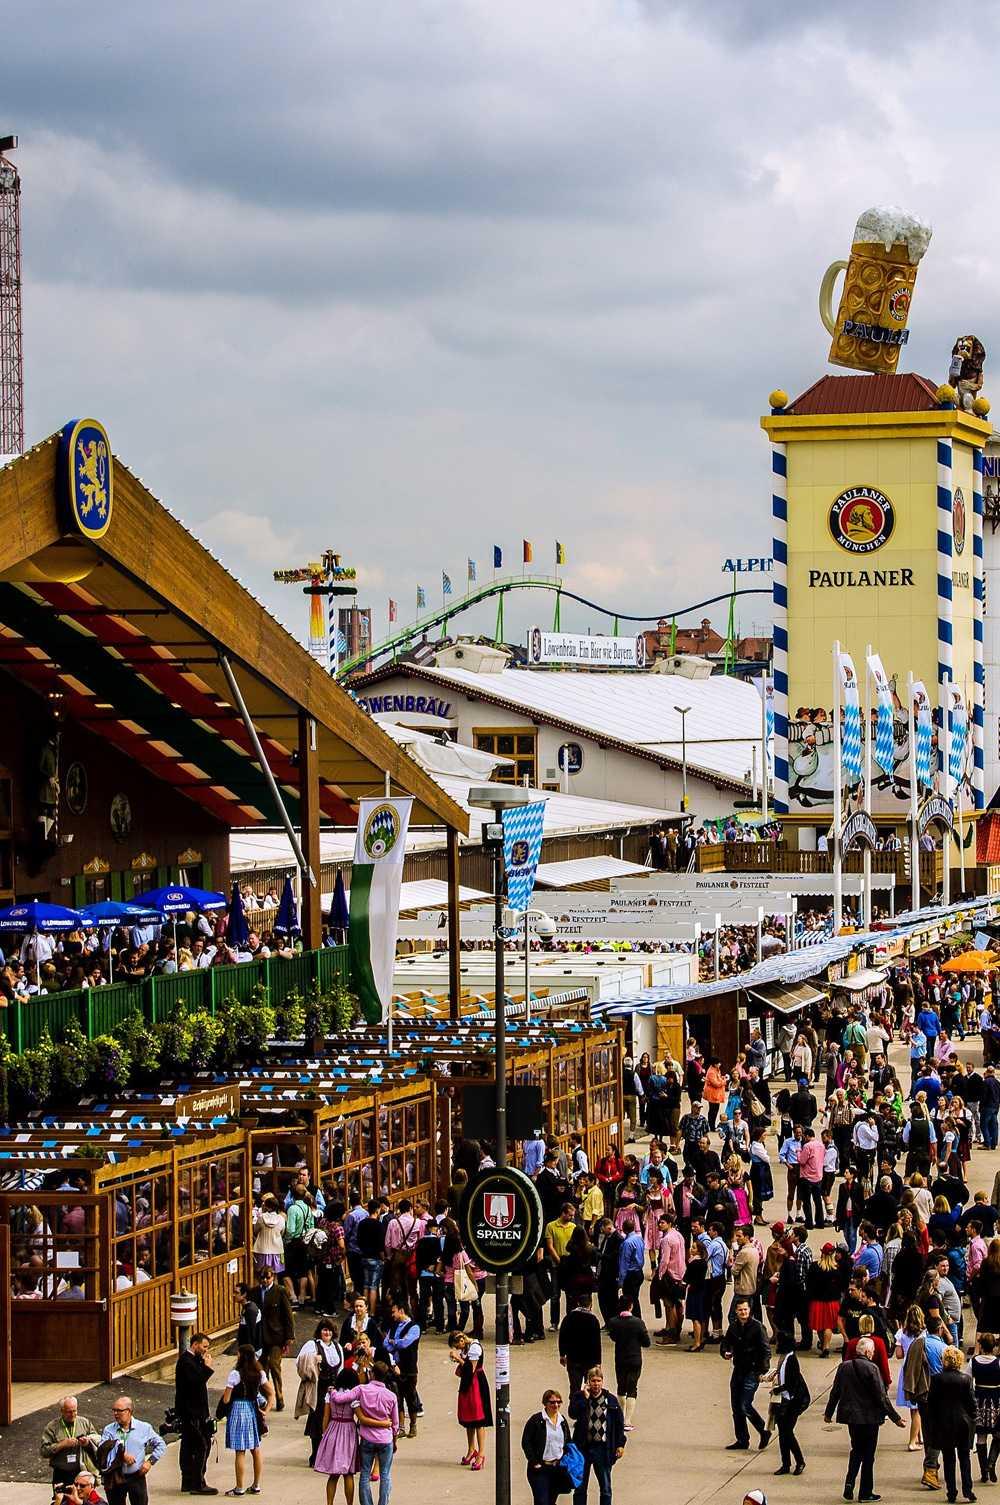 Modern day Oktoberfest Wiesn from above.